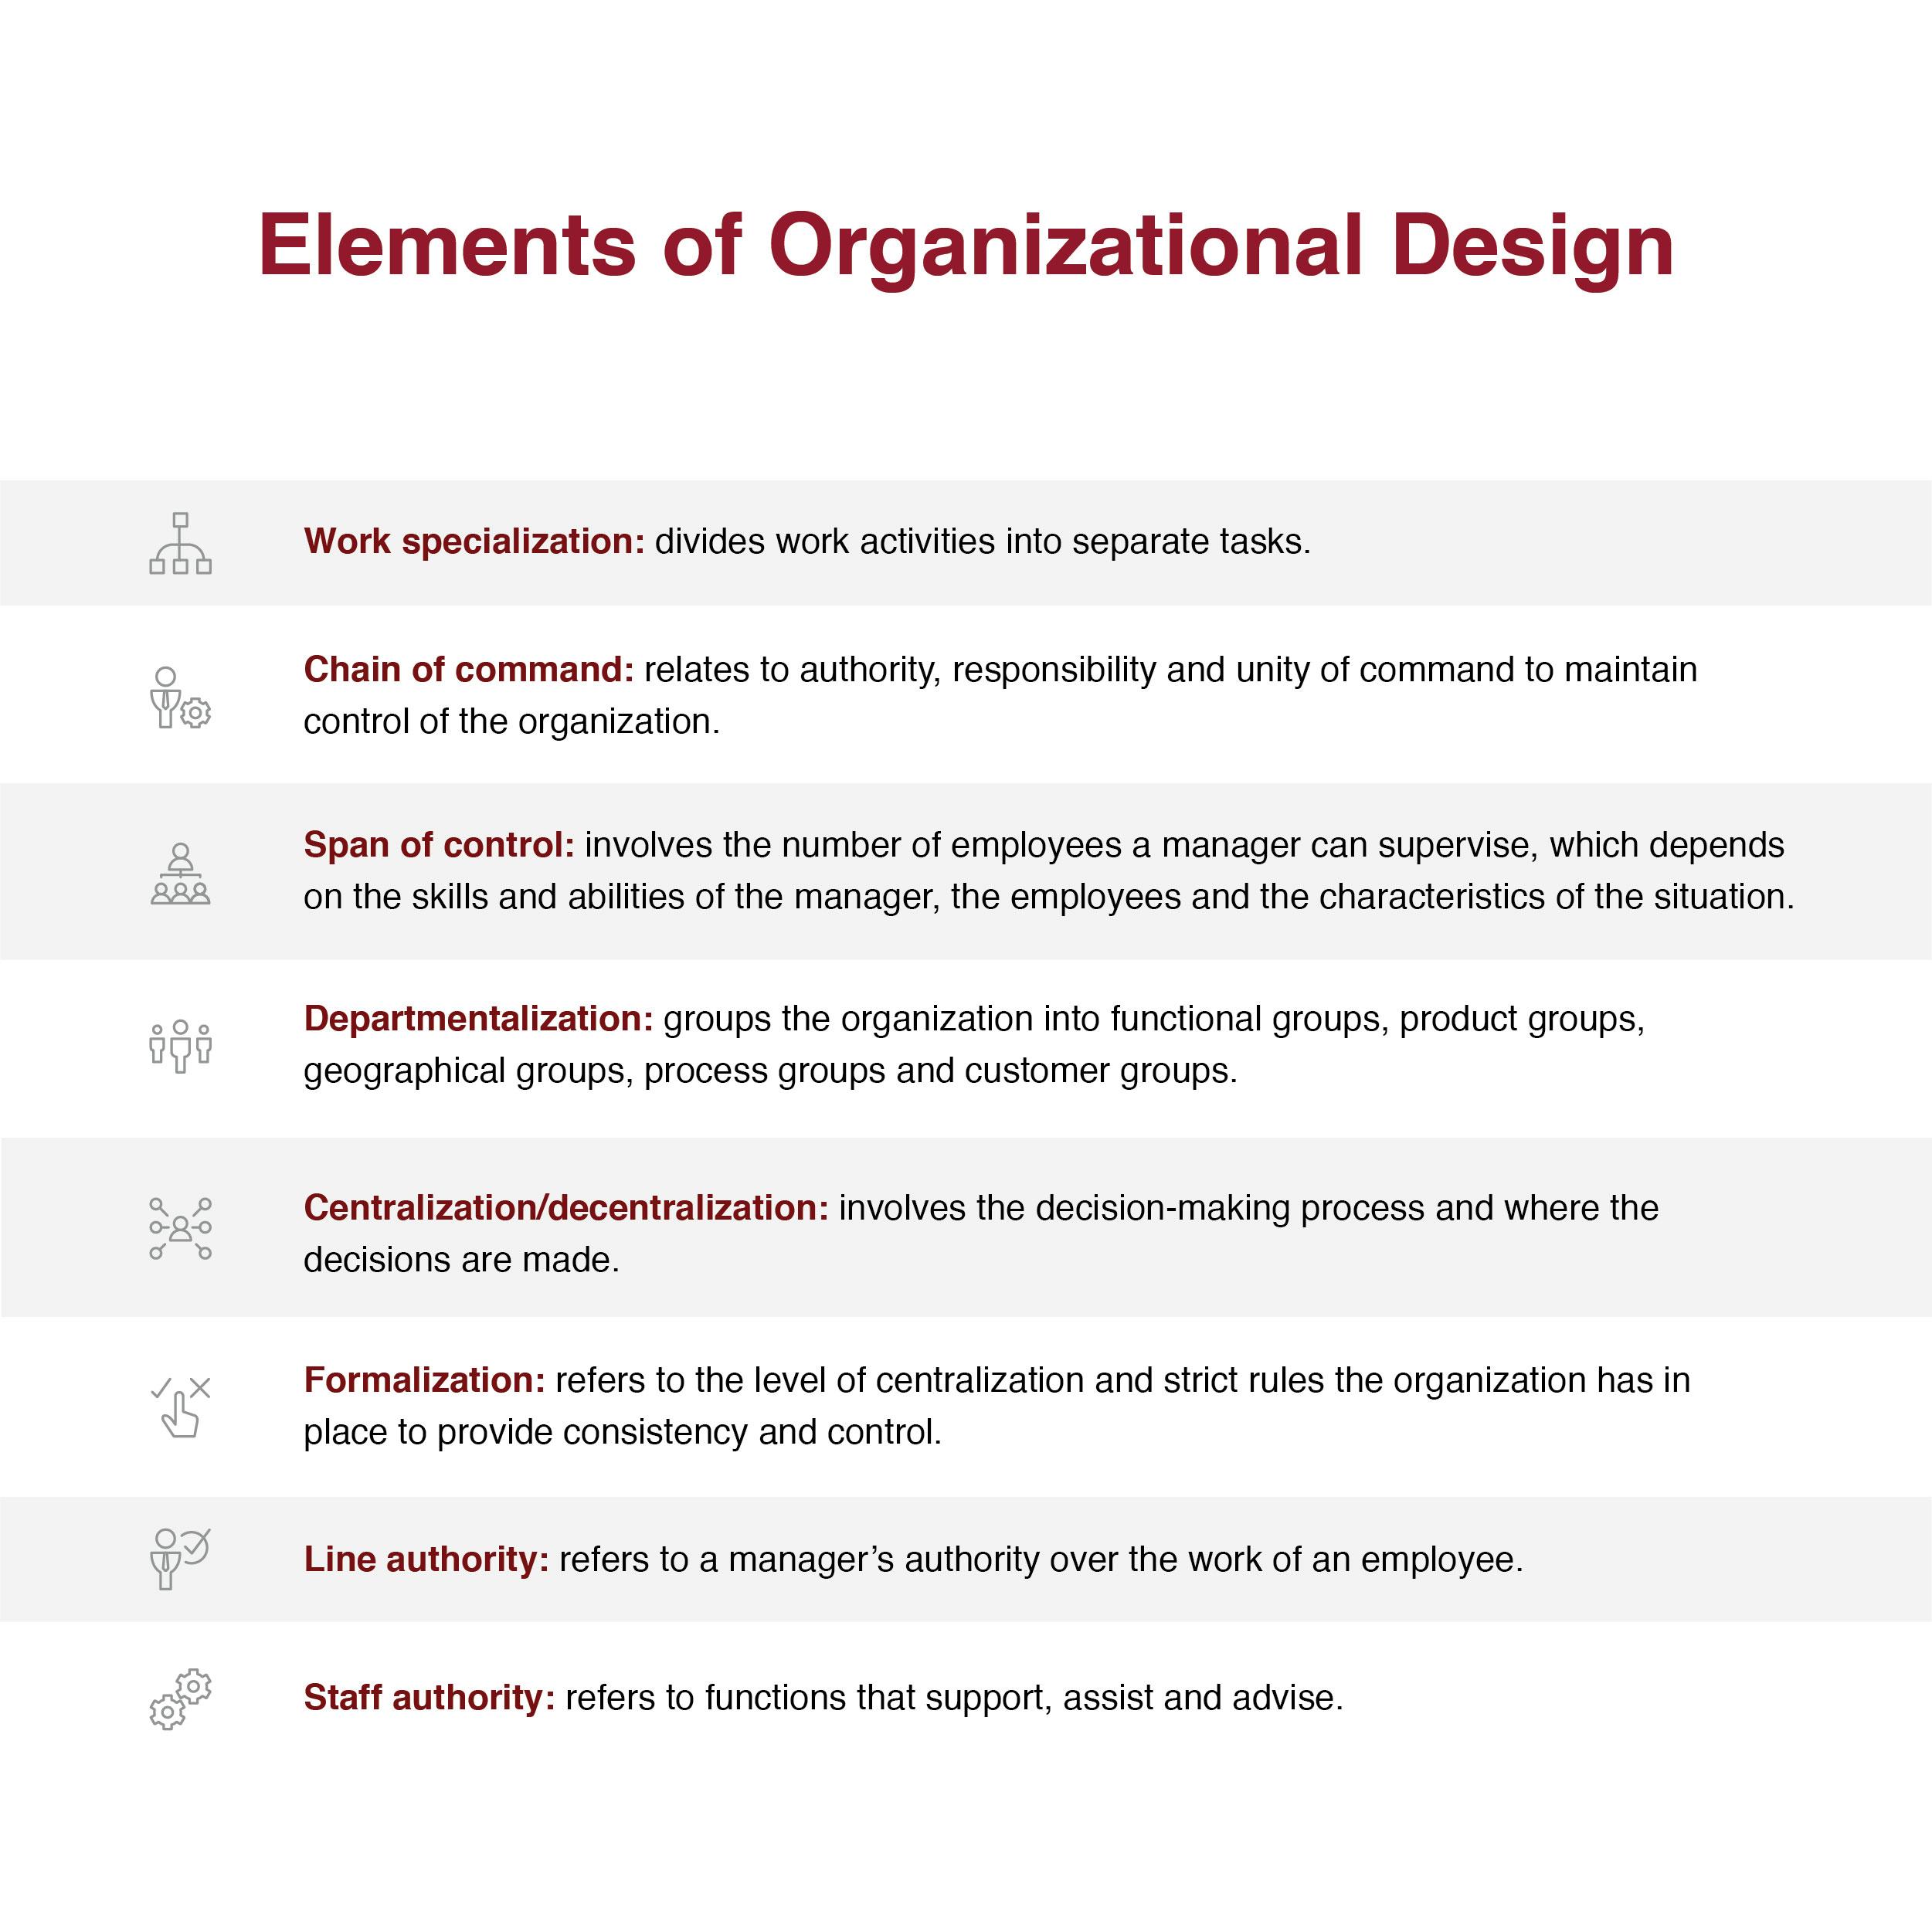 Elements of Organizational Design